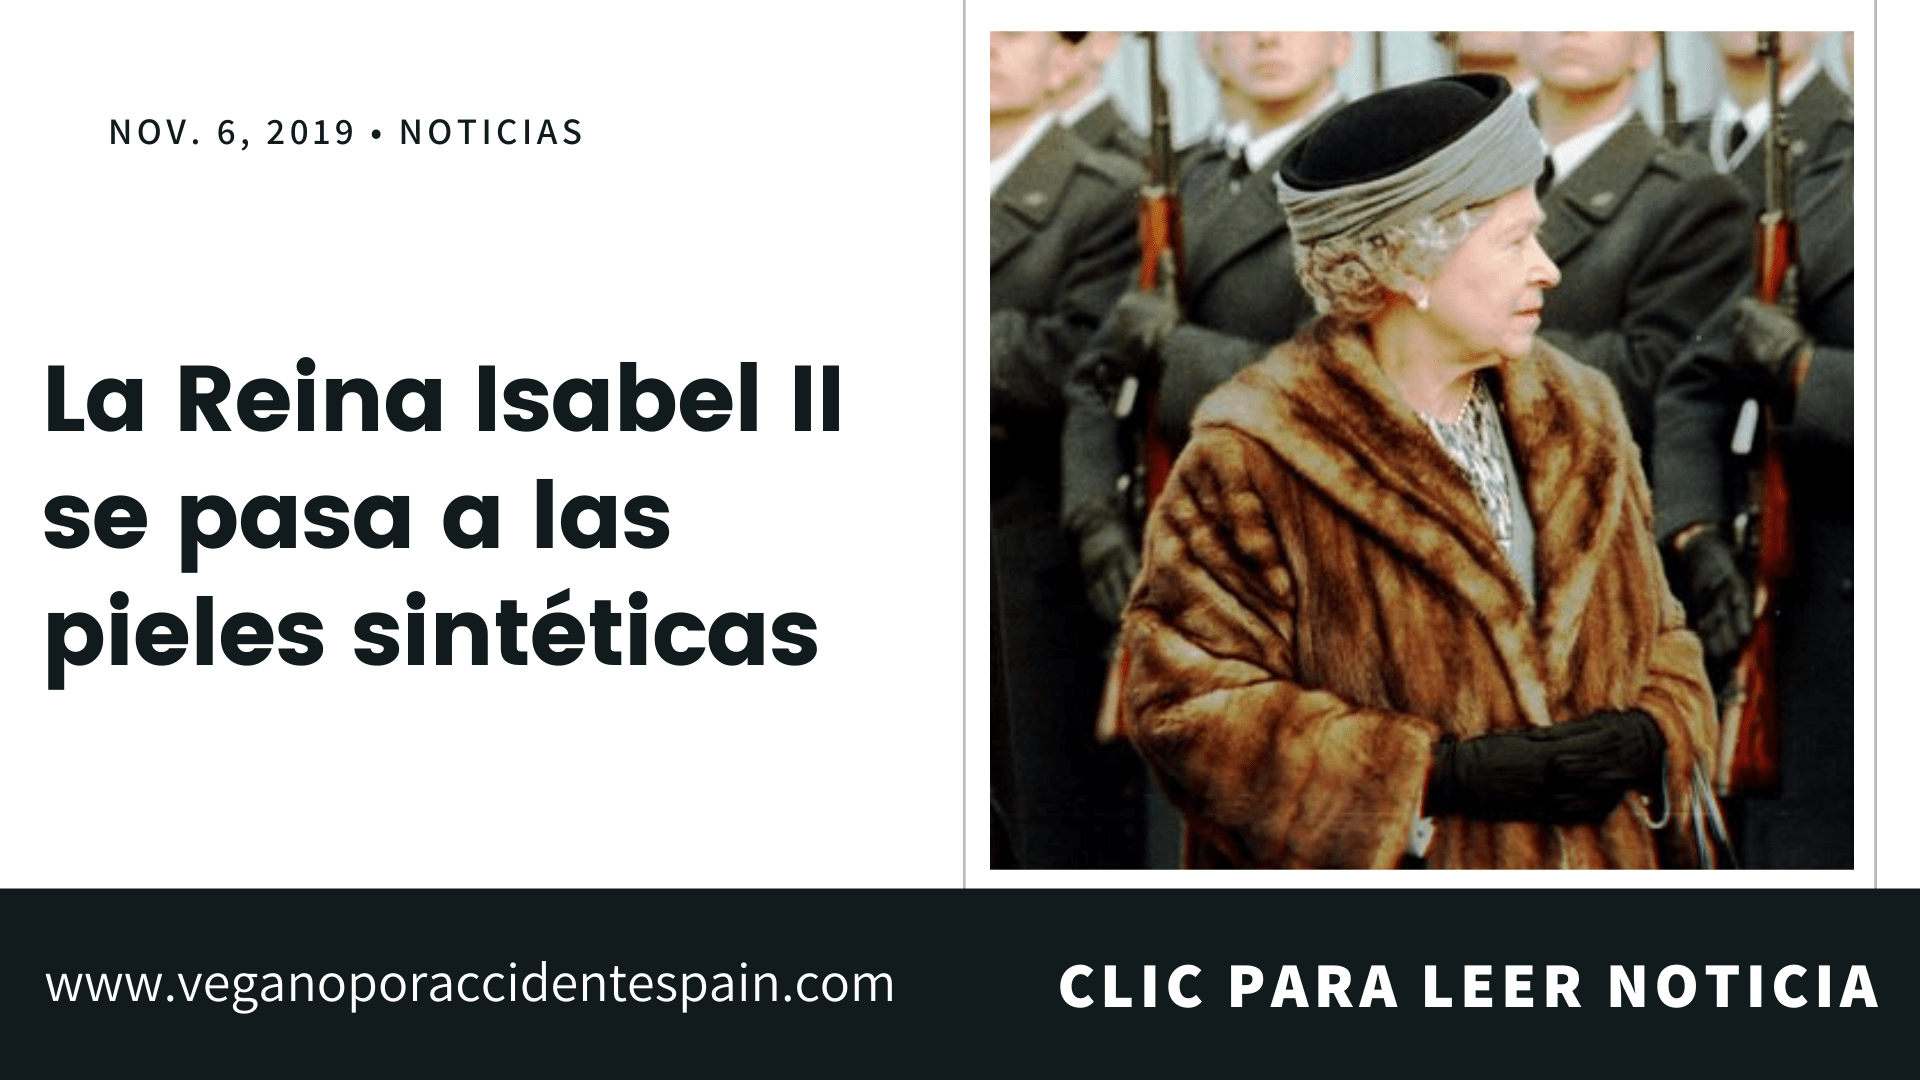 La reina Isabel II se pasa a las pieles sinteticas